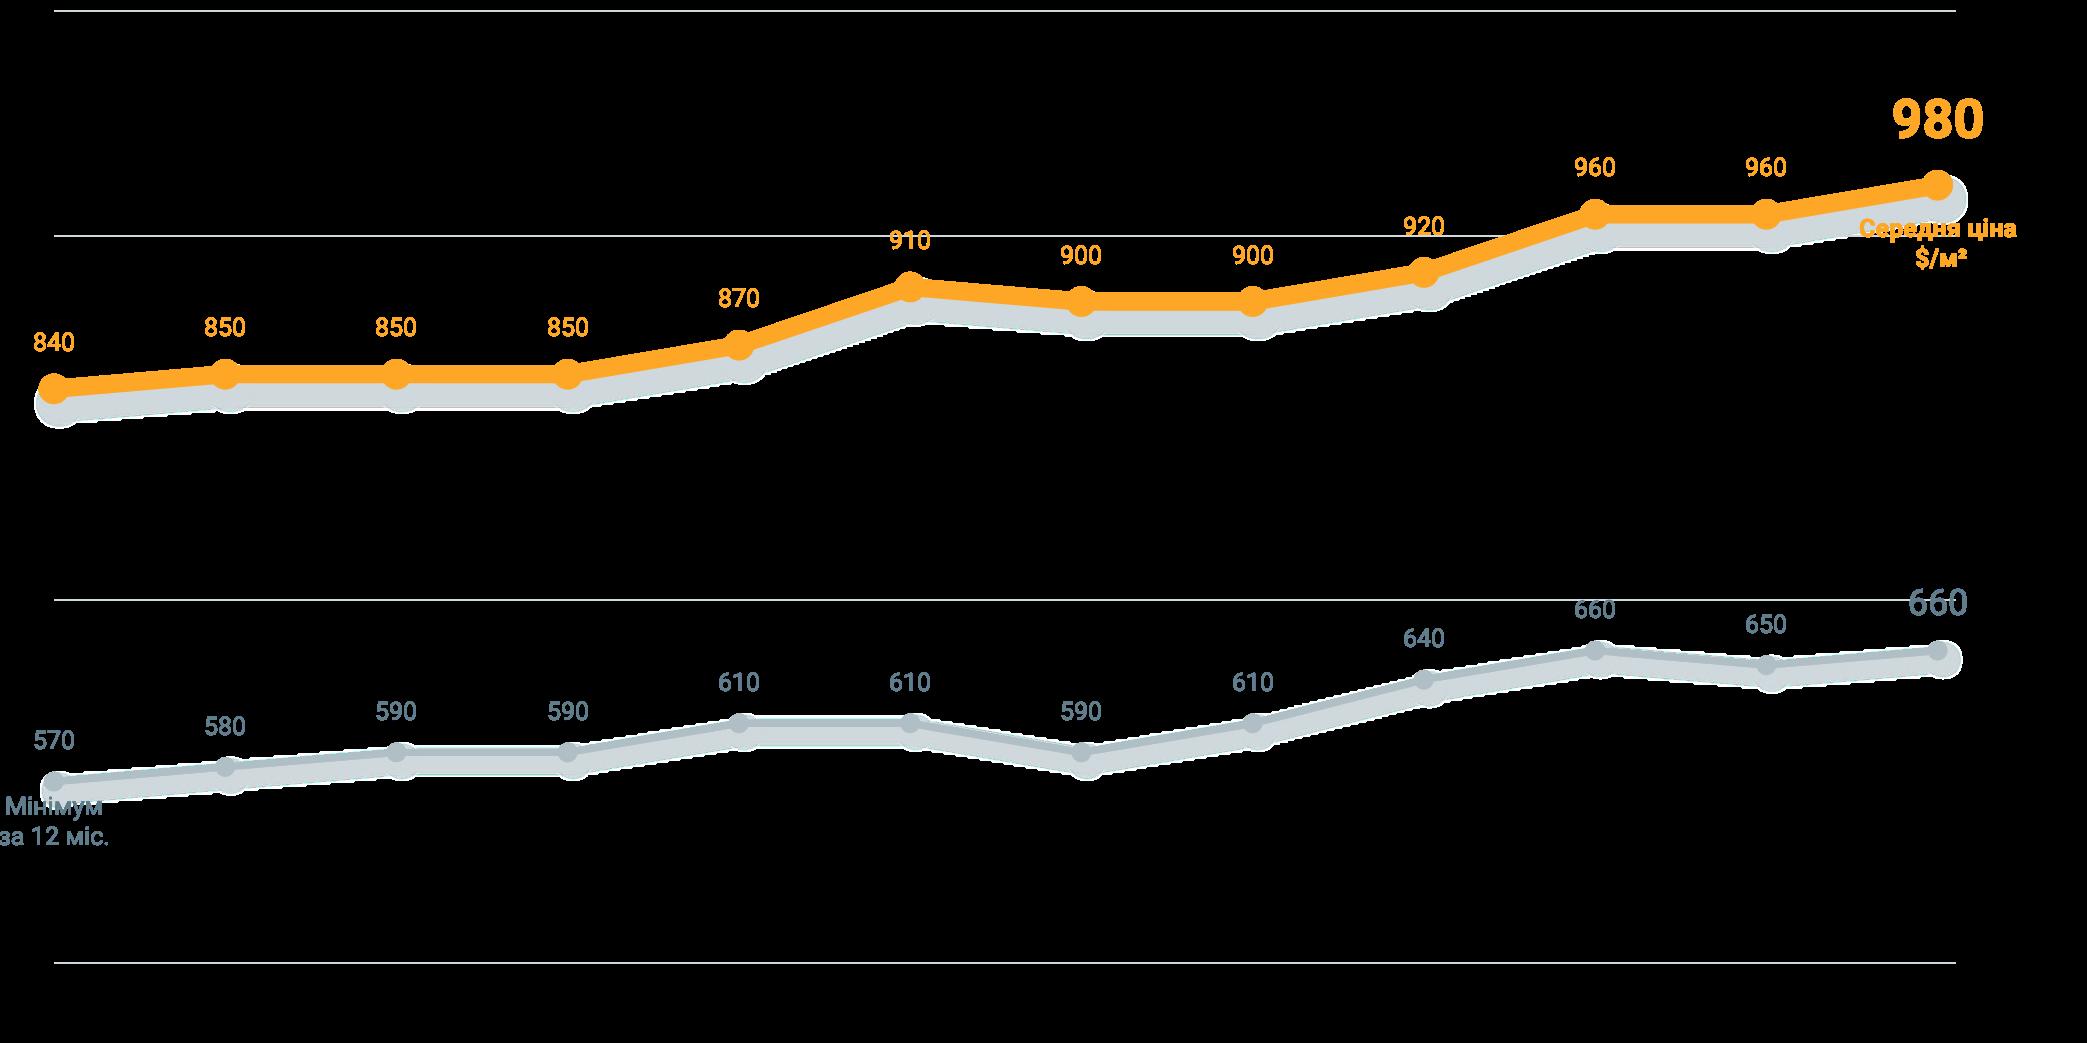 Анализ рынка недвижимости осени 2019 года динамика стоимости квартир в долларе